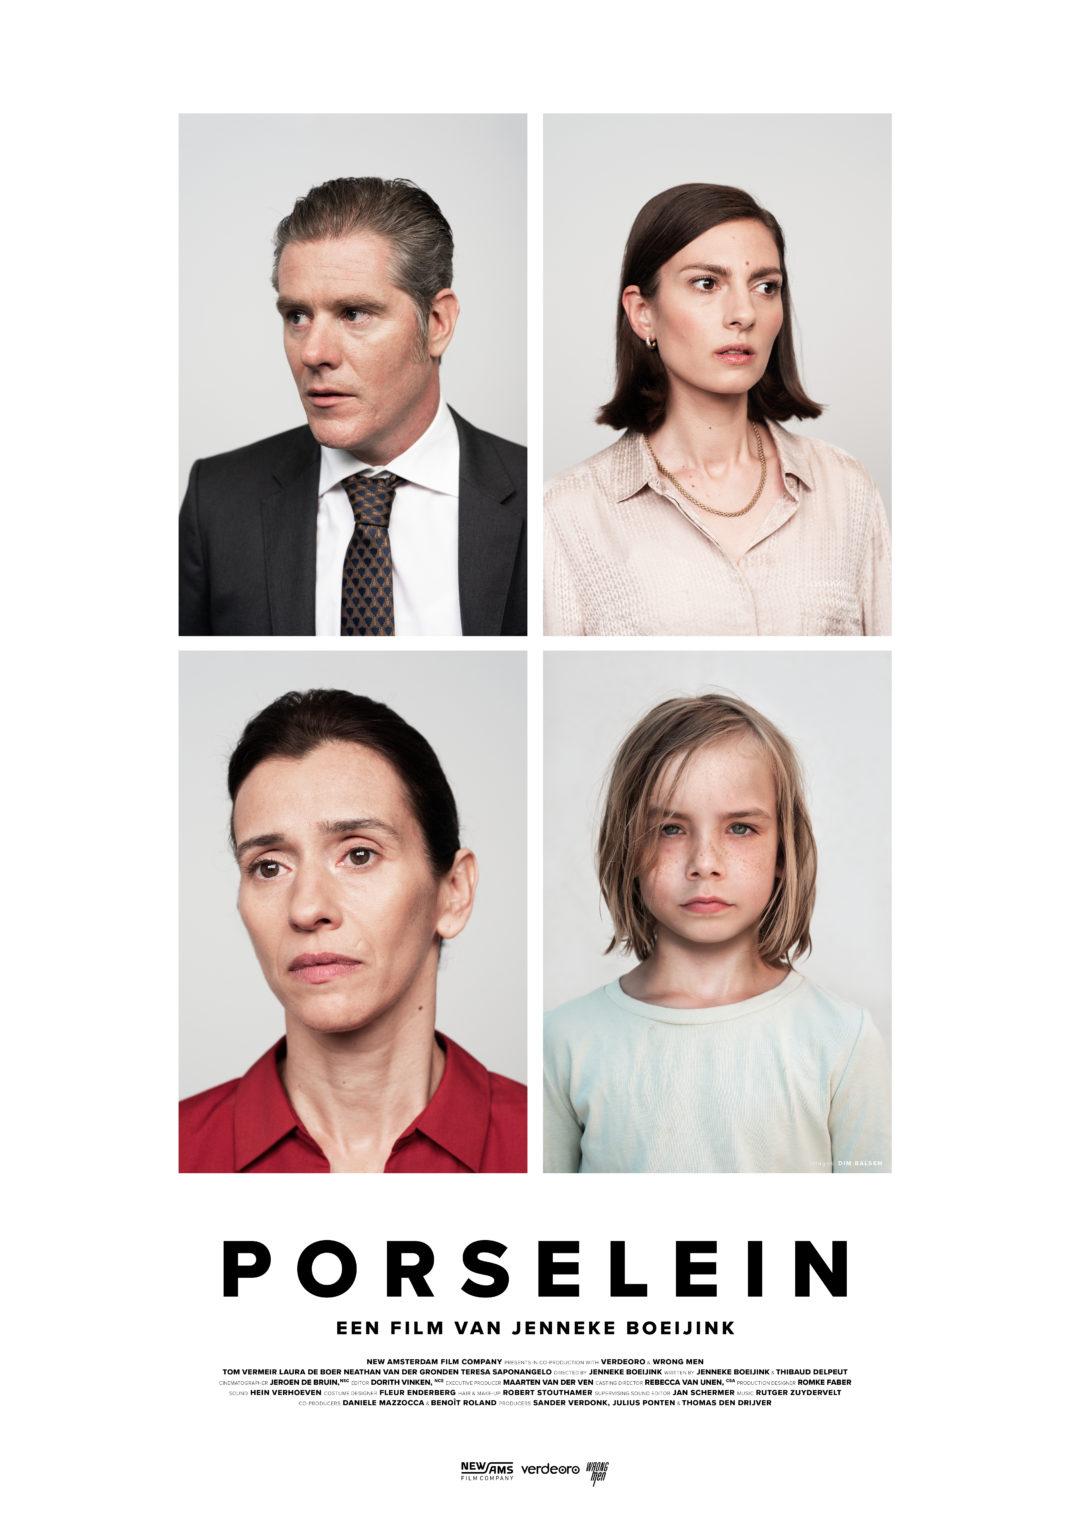 Porselein_ps_1_jpg_sd-high.jpg